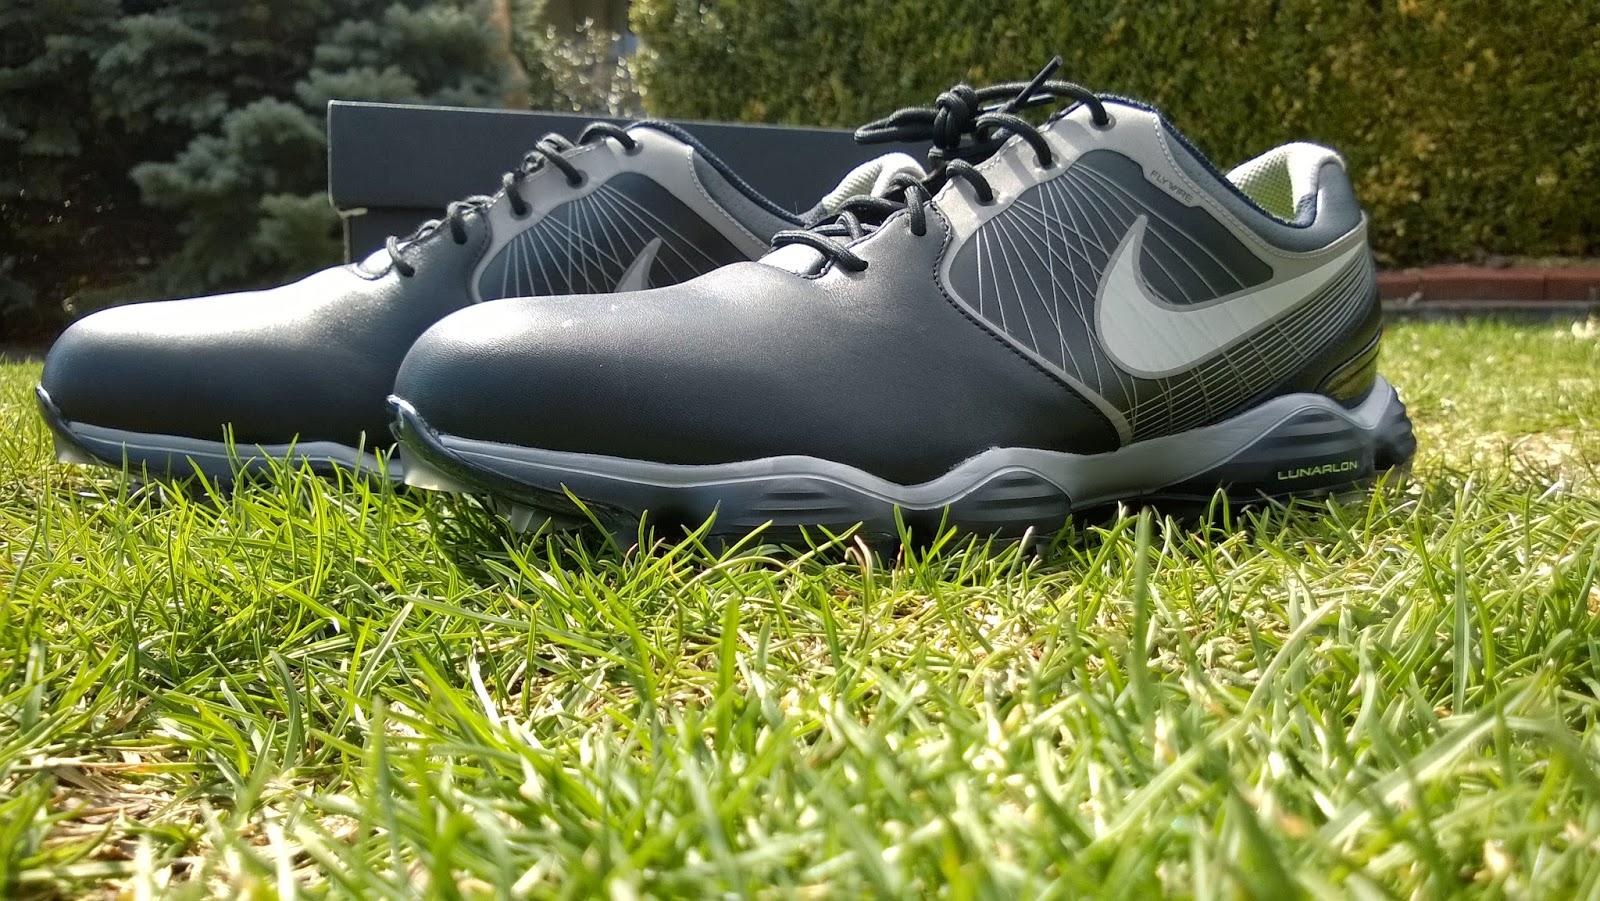 promo code 5f5bf 9d2bd Nike Golf Lunar Control II Golf Shoes Review